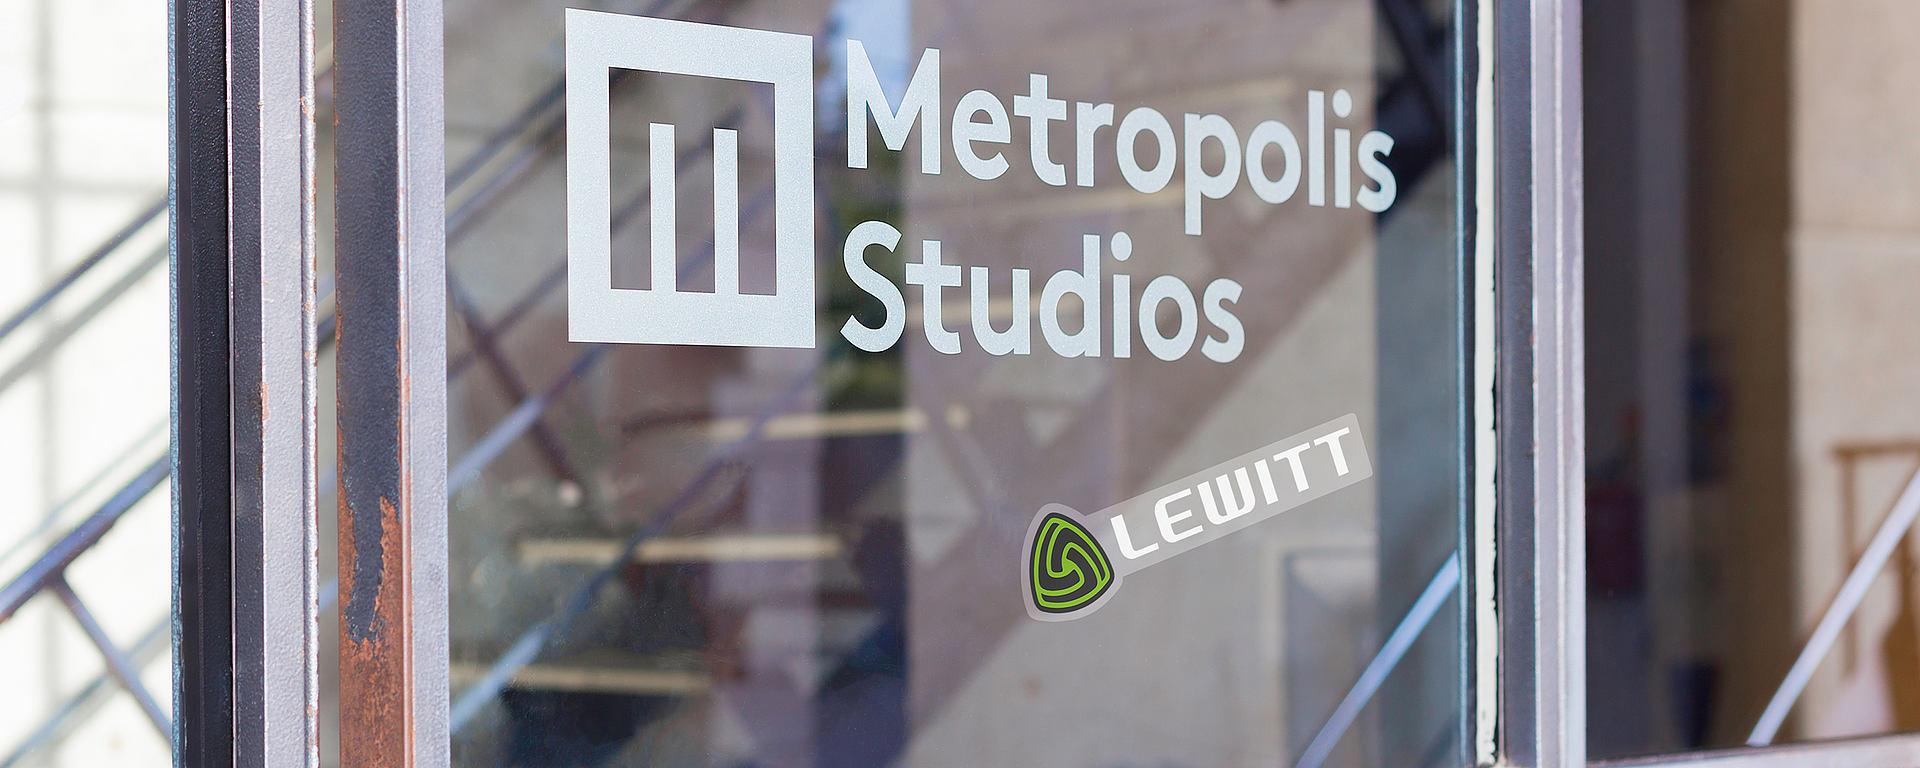 Metropolis [Photo © Tom Rowland]